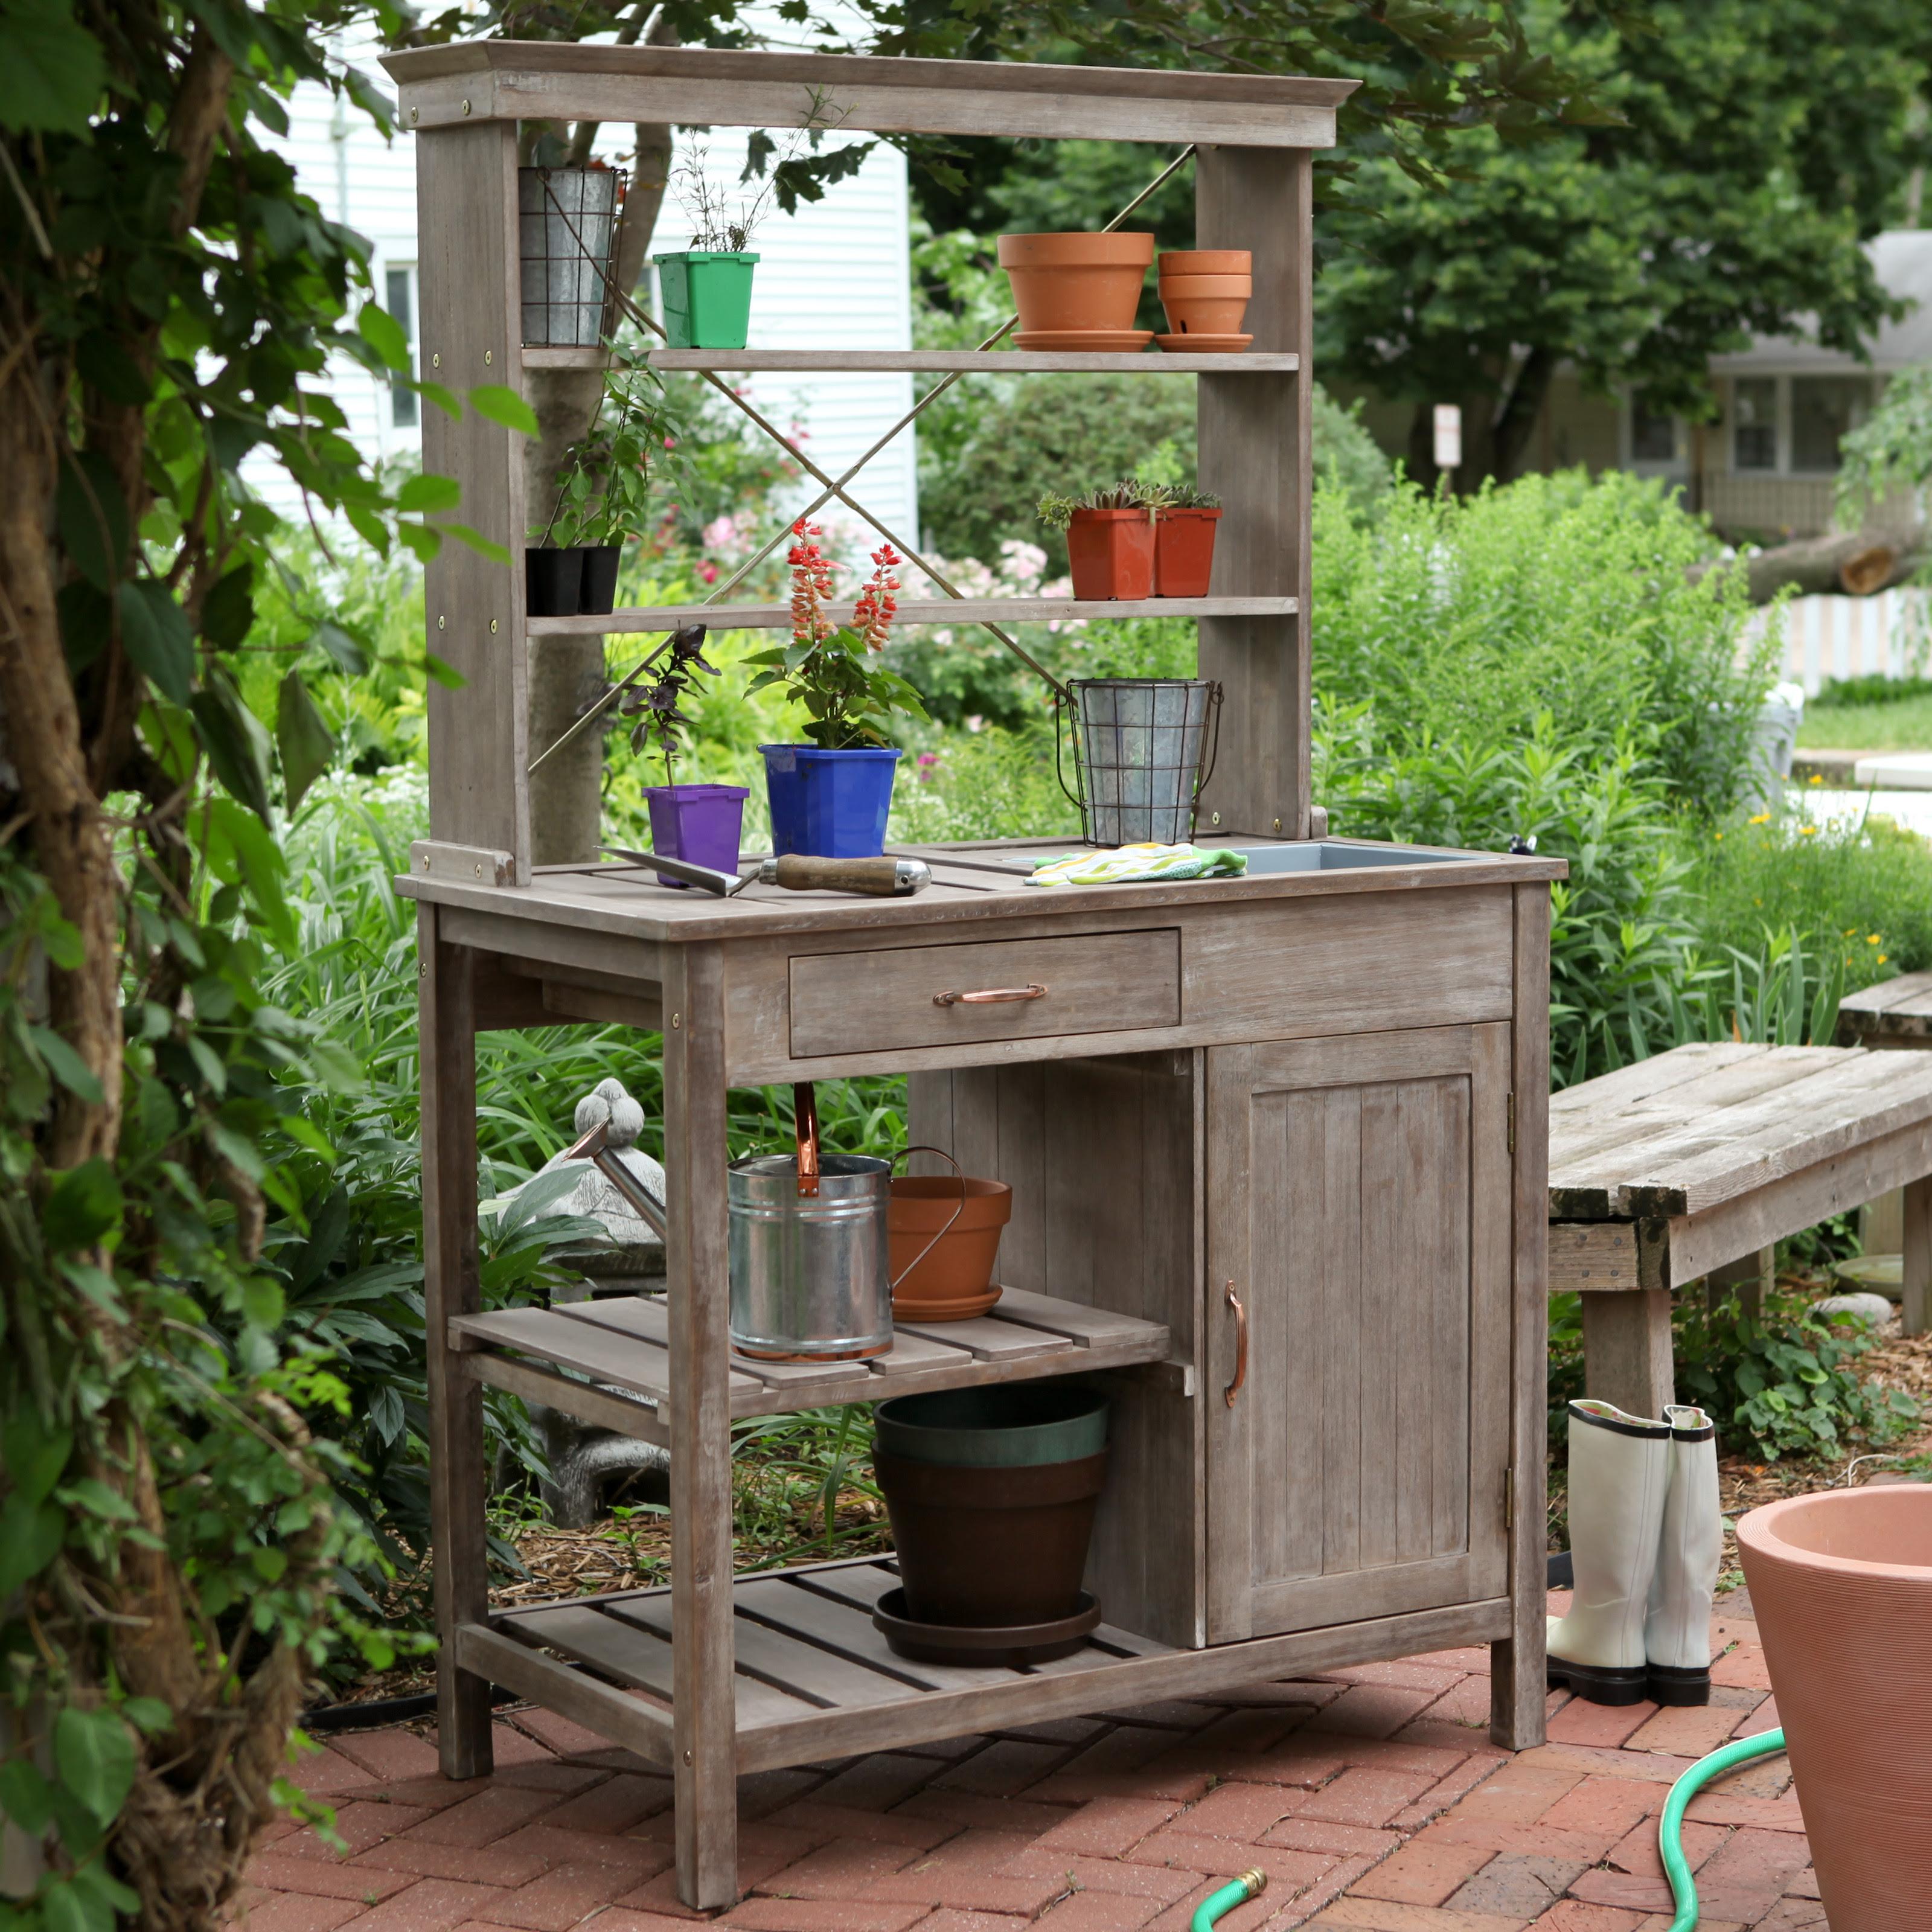 Rustic Garden Storage Potting Bench - Driftwood Finish at ...